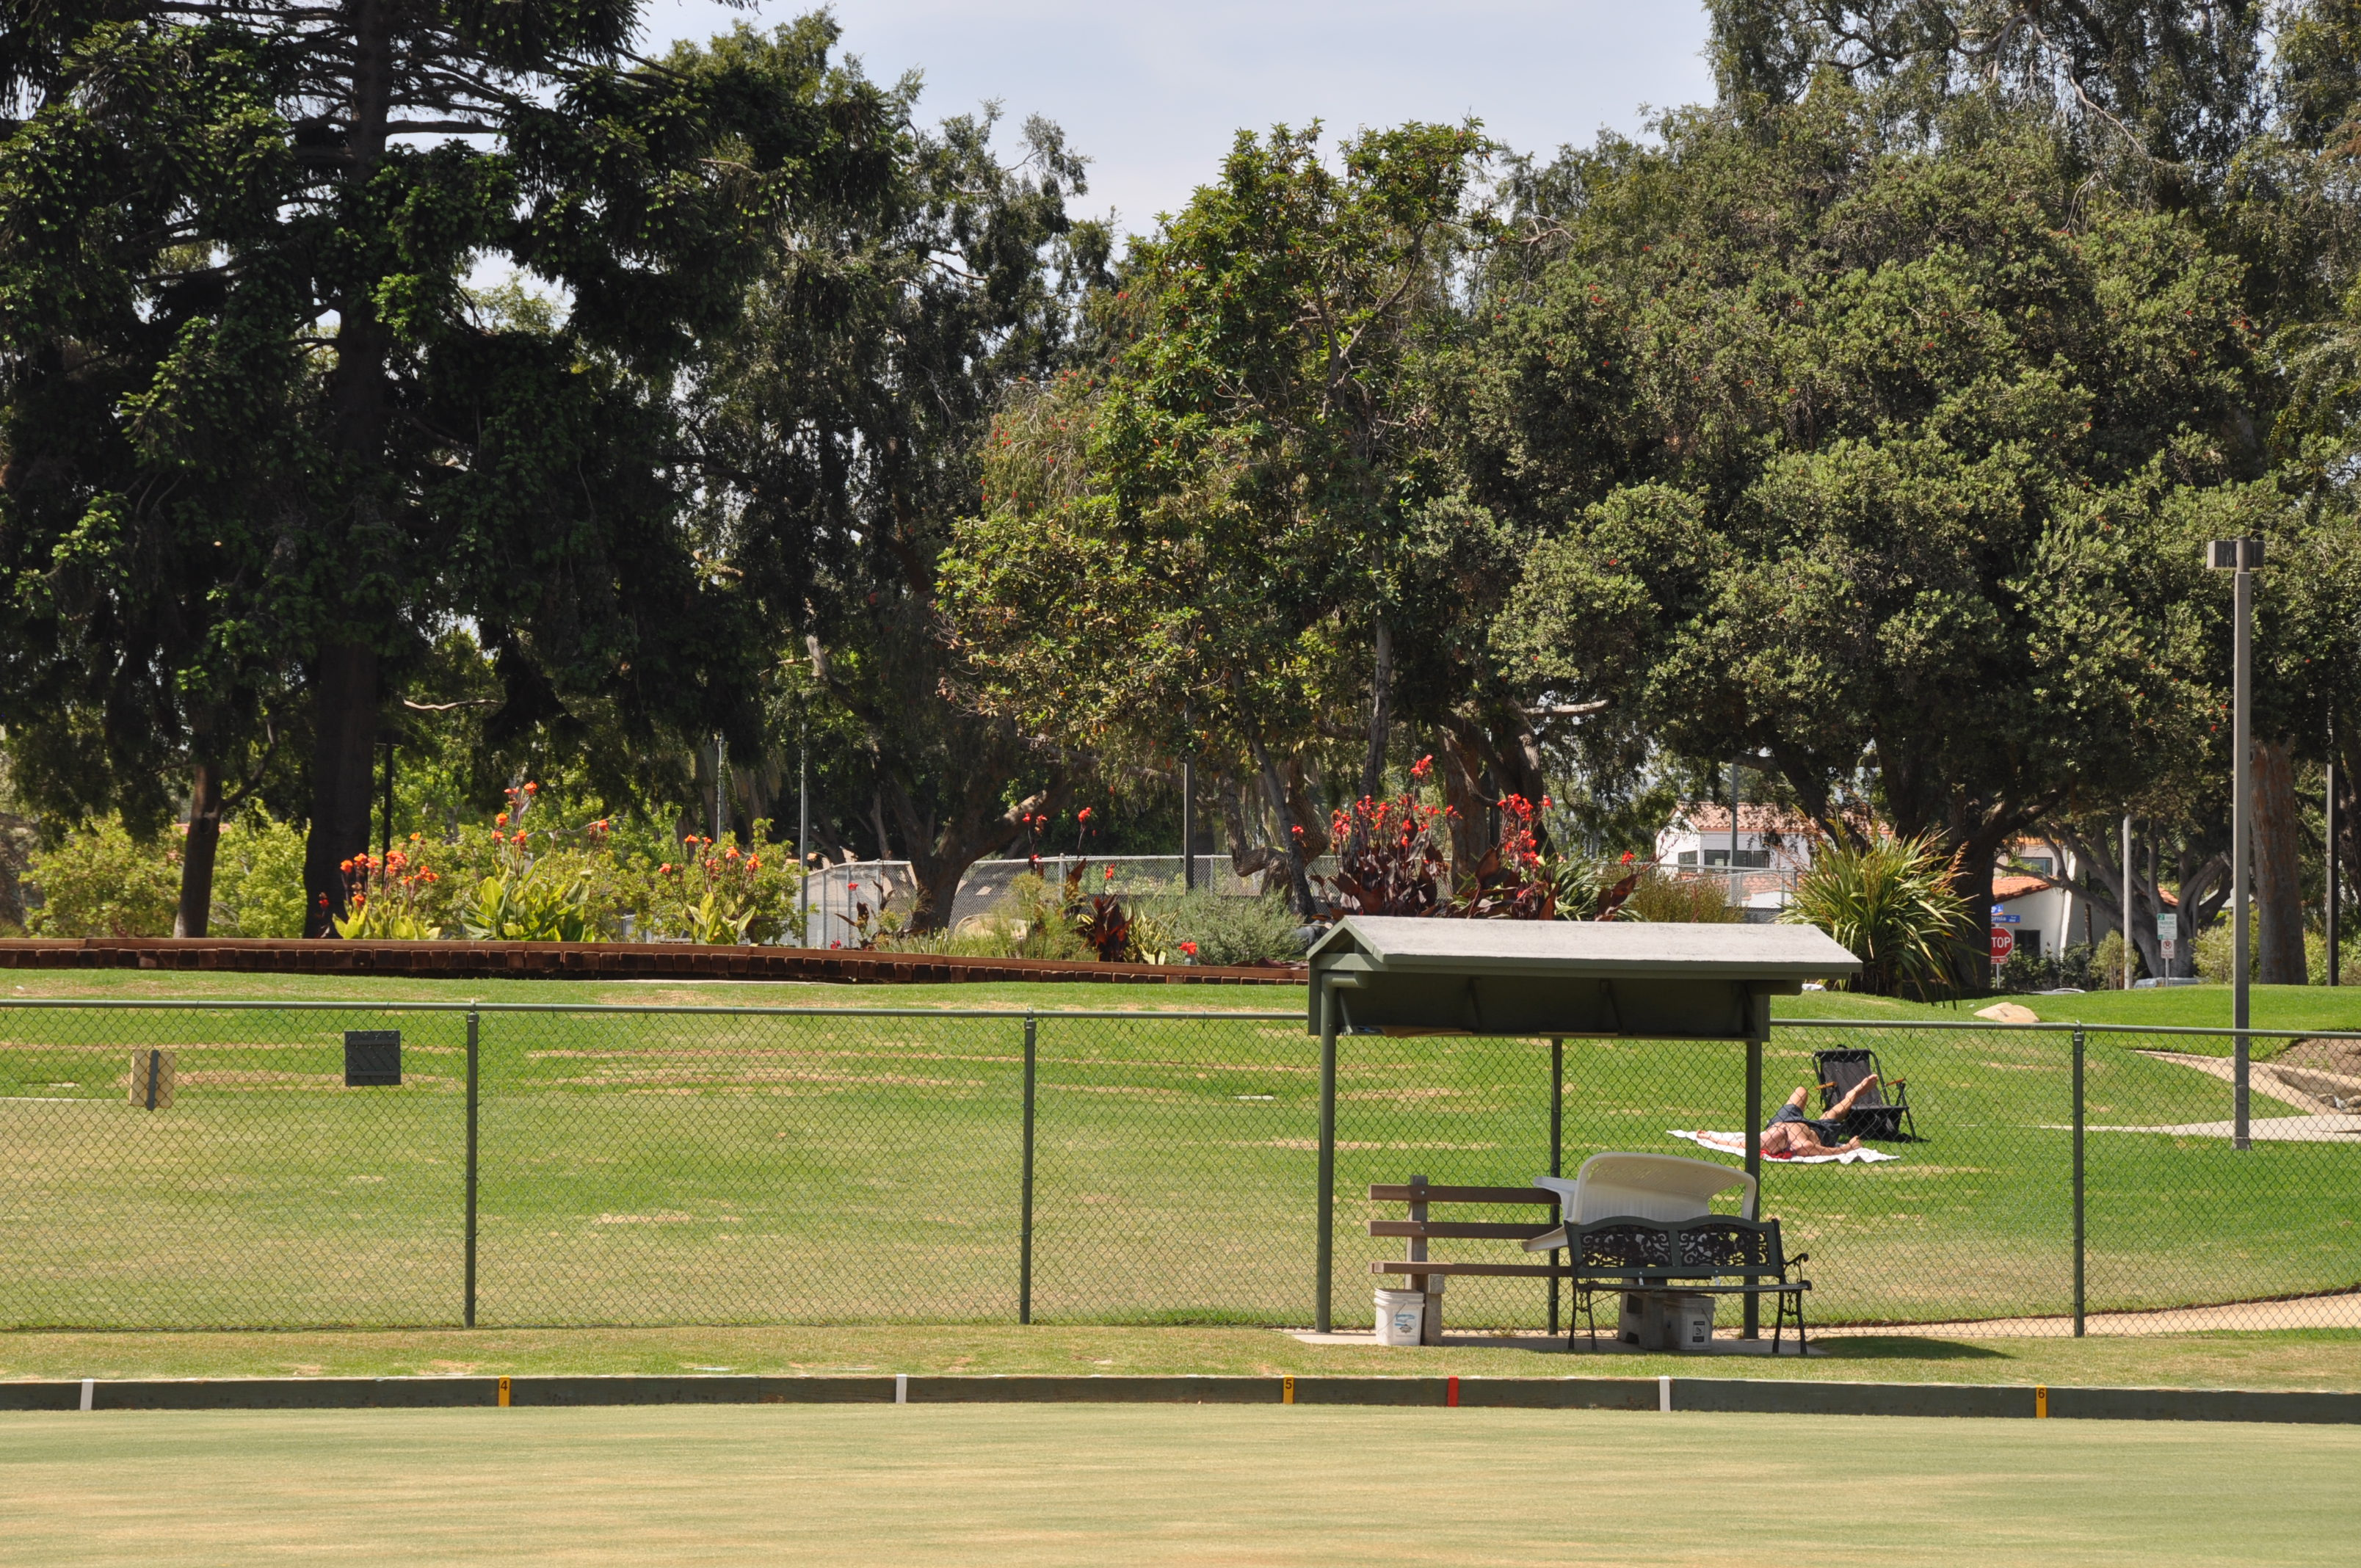 Greens Park